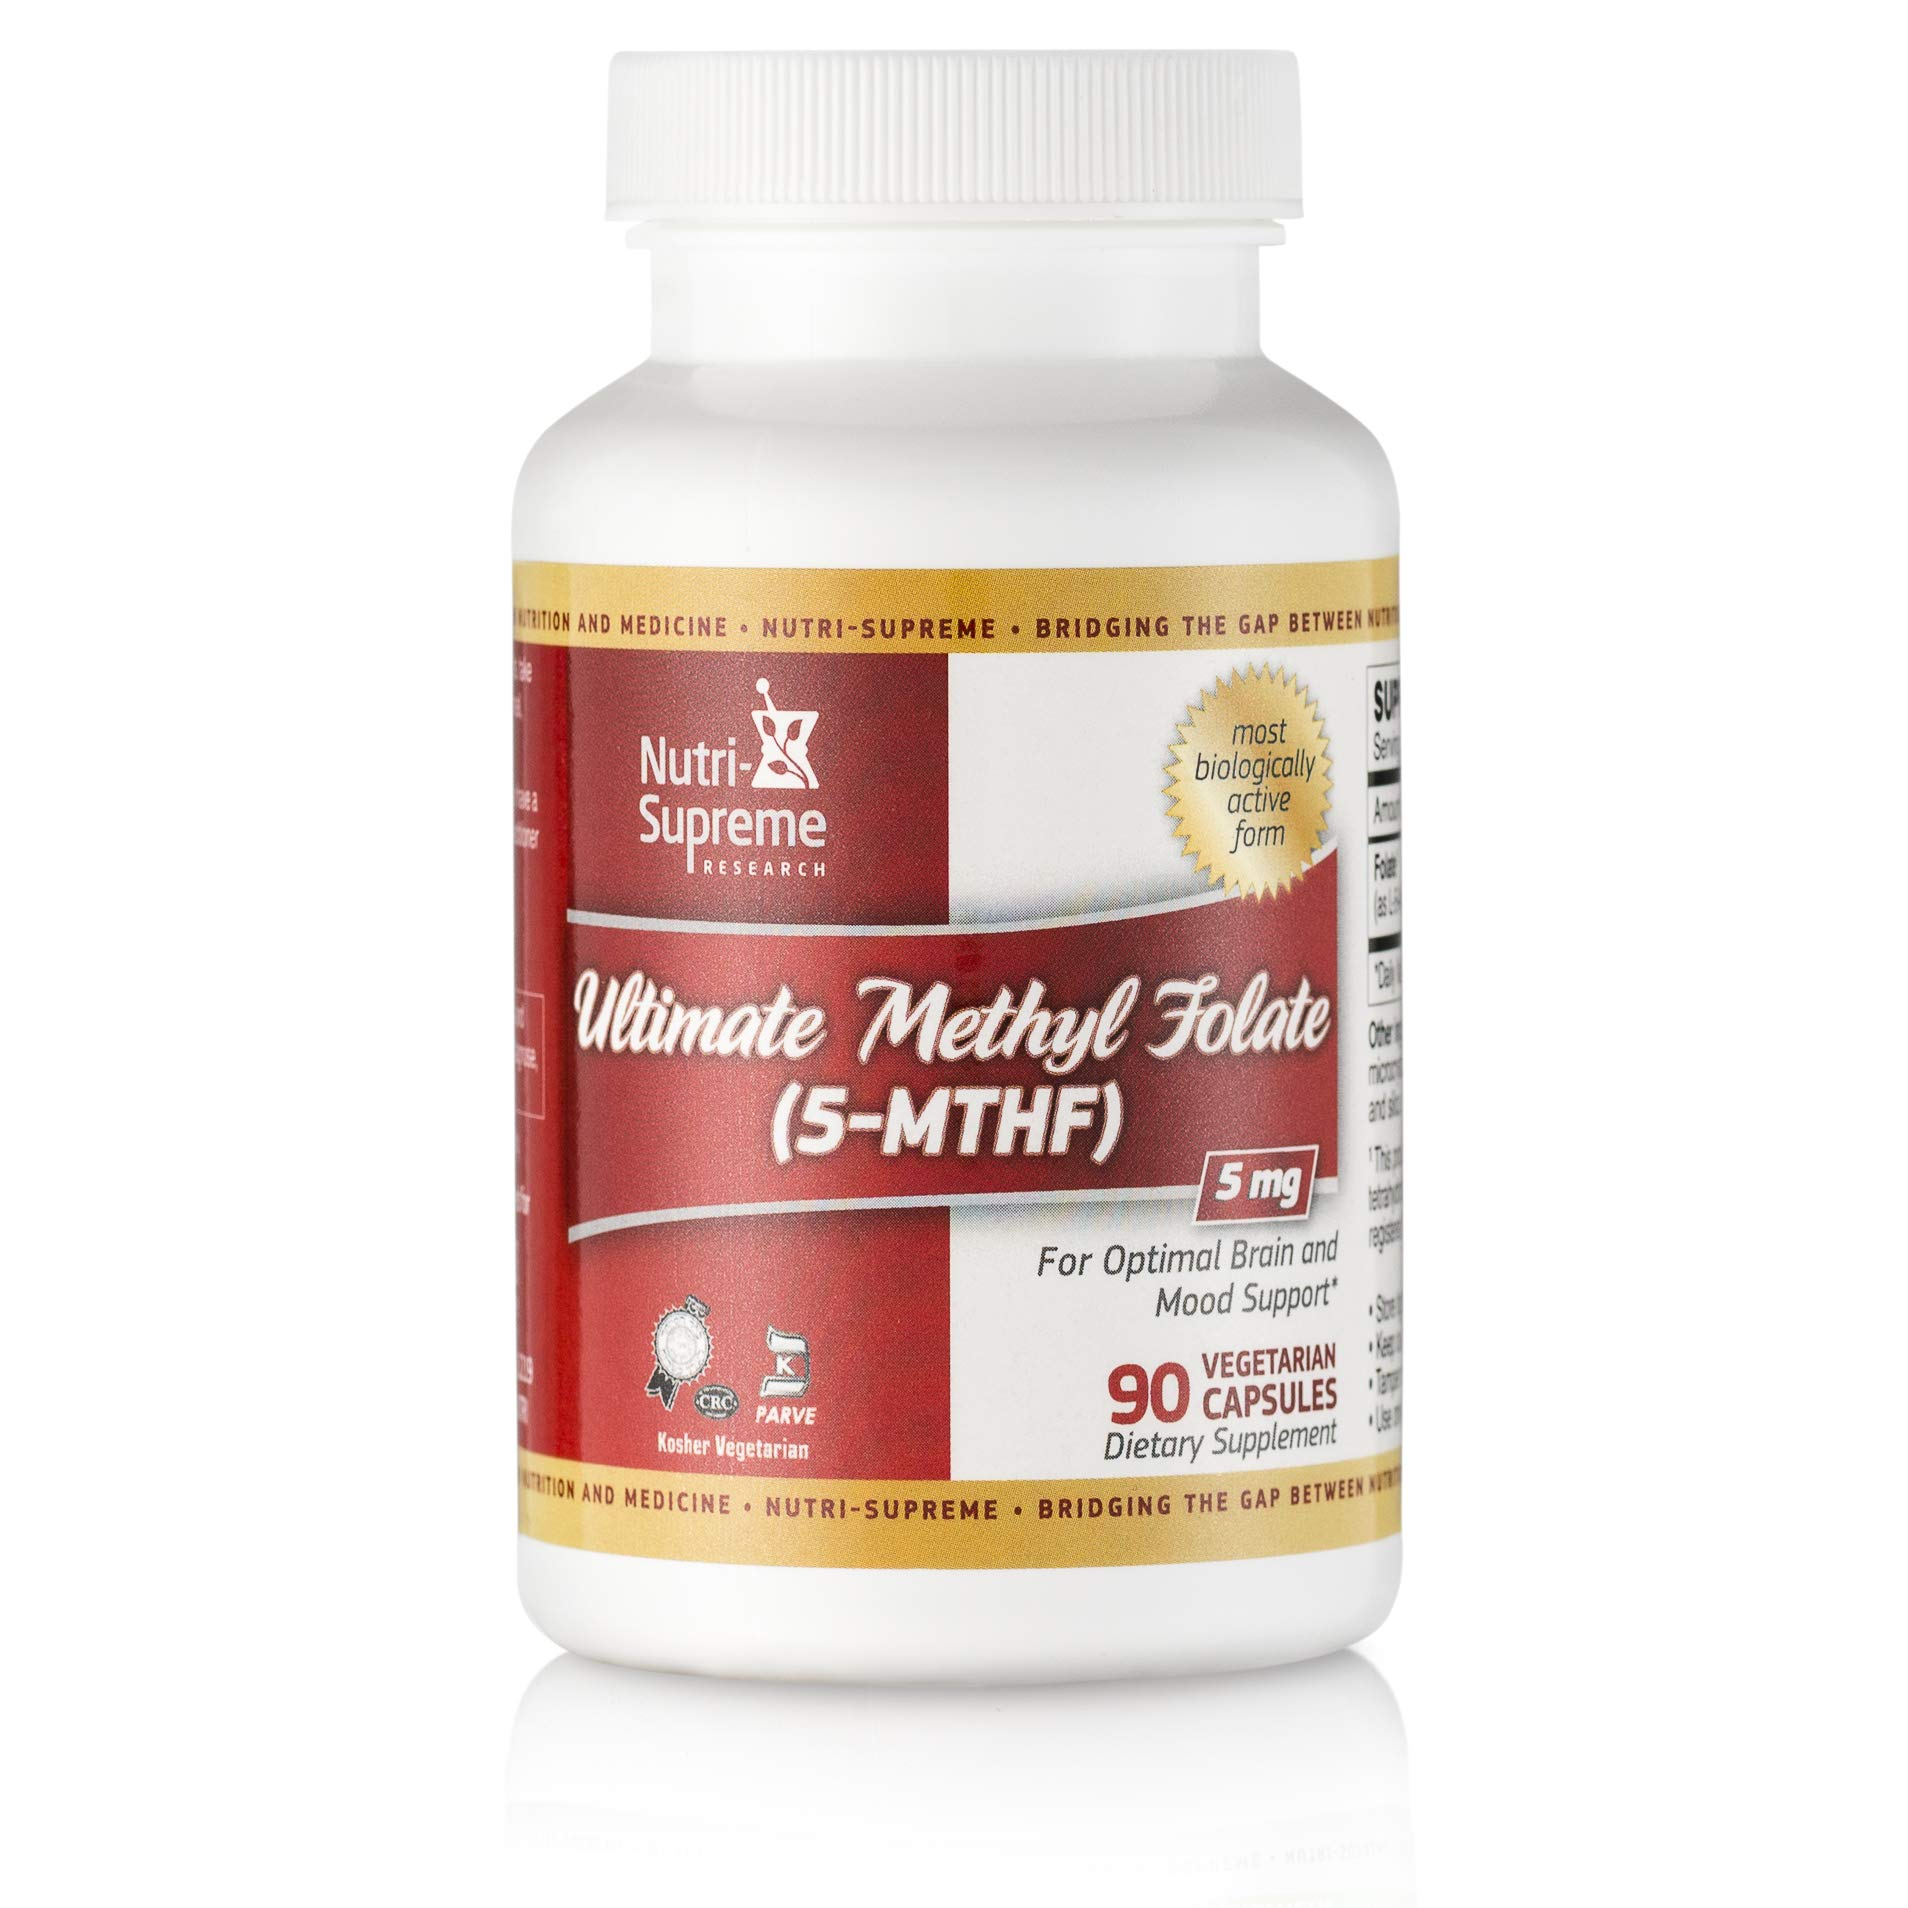 Nutri-Supreme Research Ultimate Methyl Folate (5-MTHF) 5 Mg - 90 Vegetarian Capsules